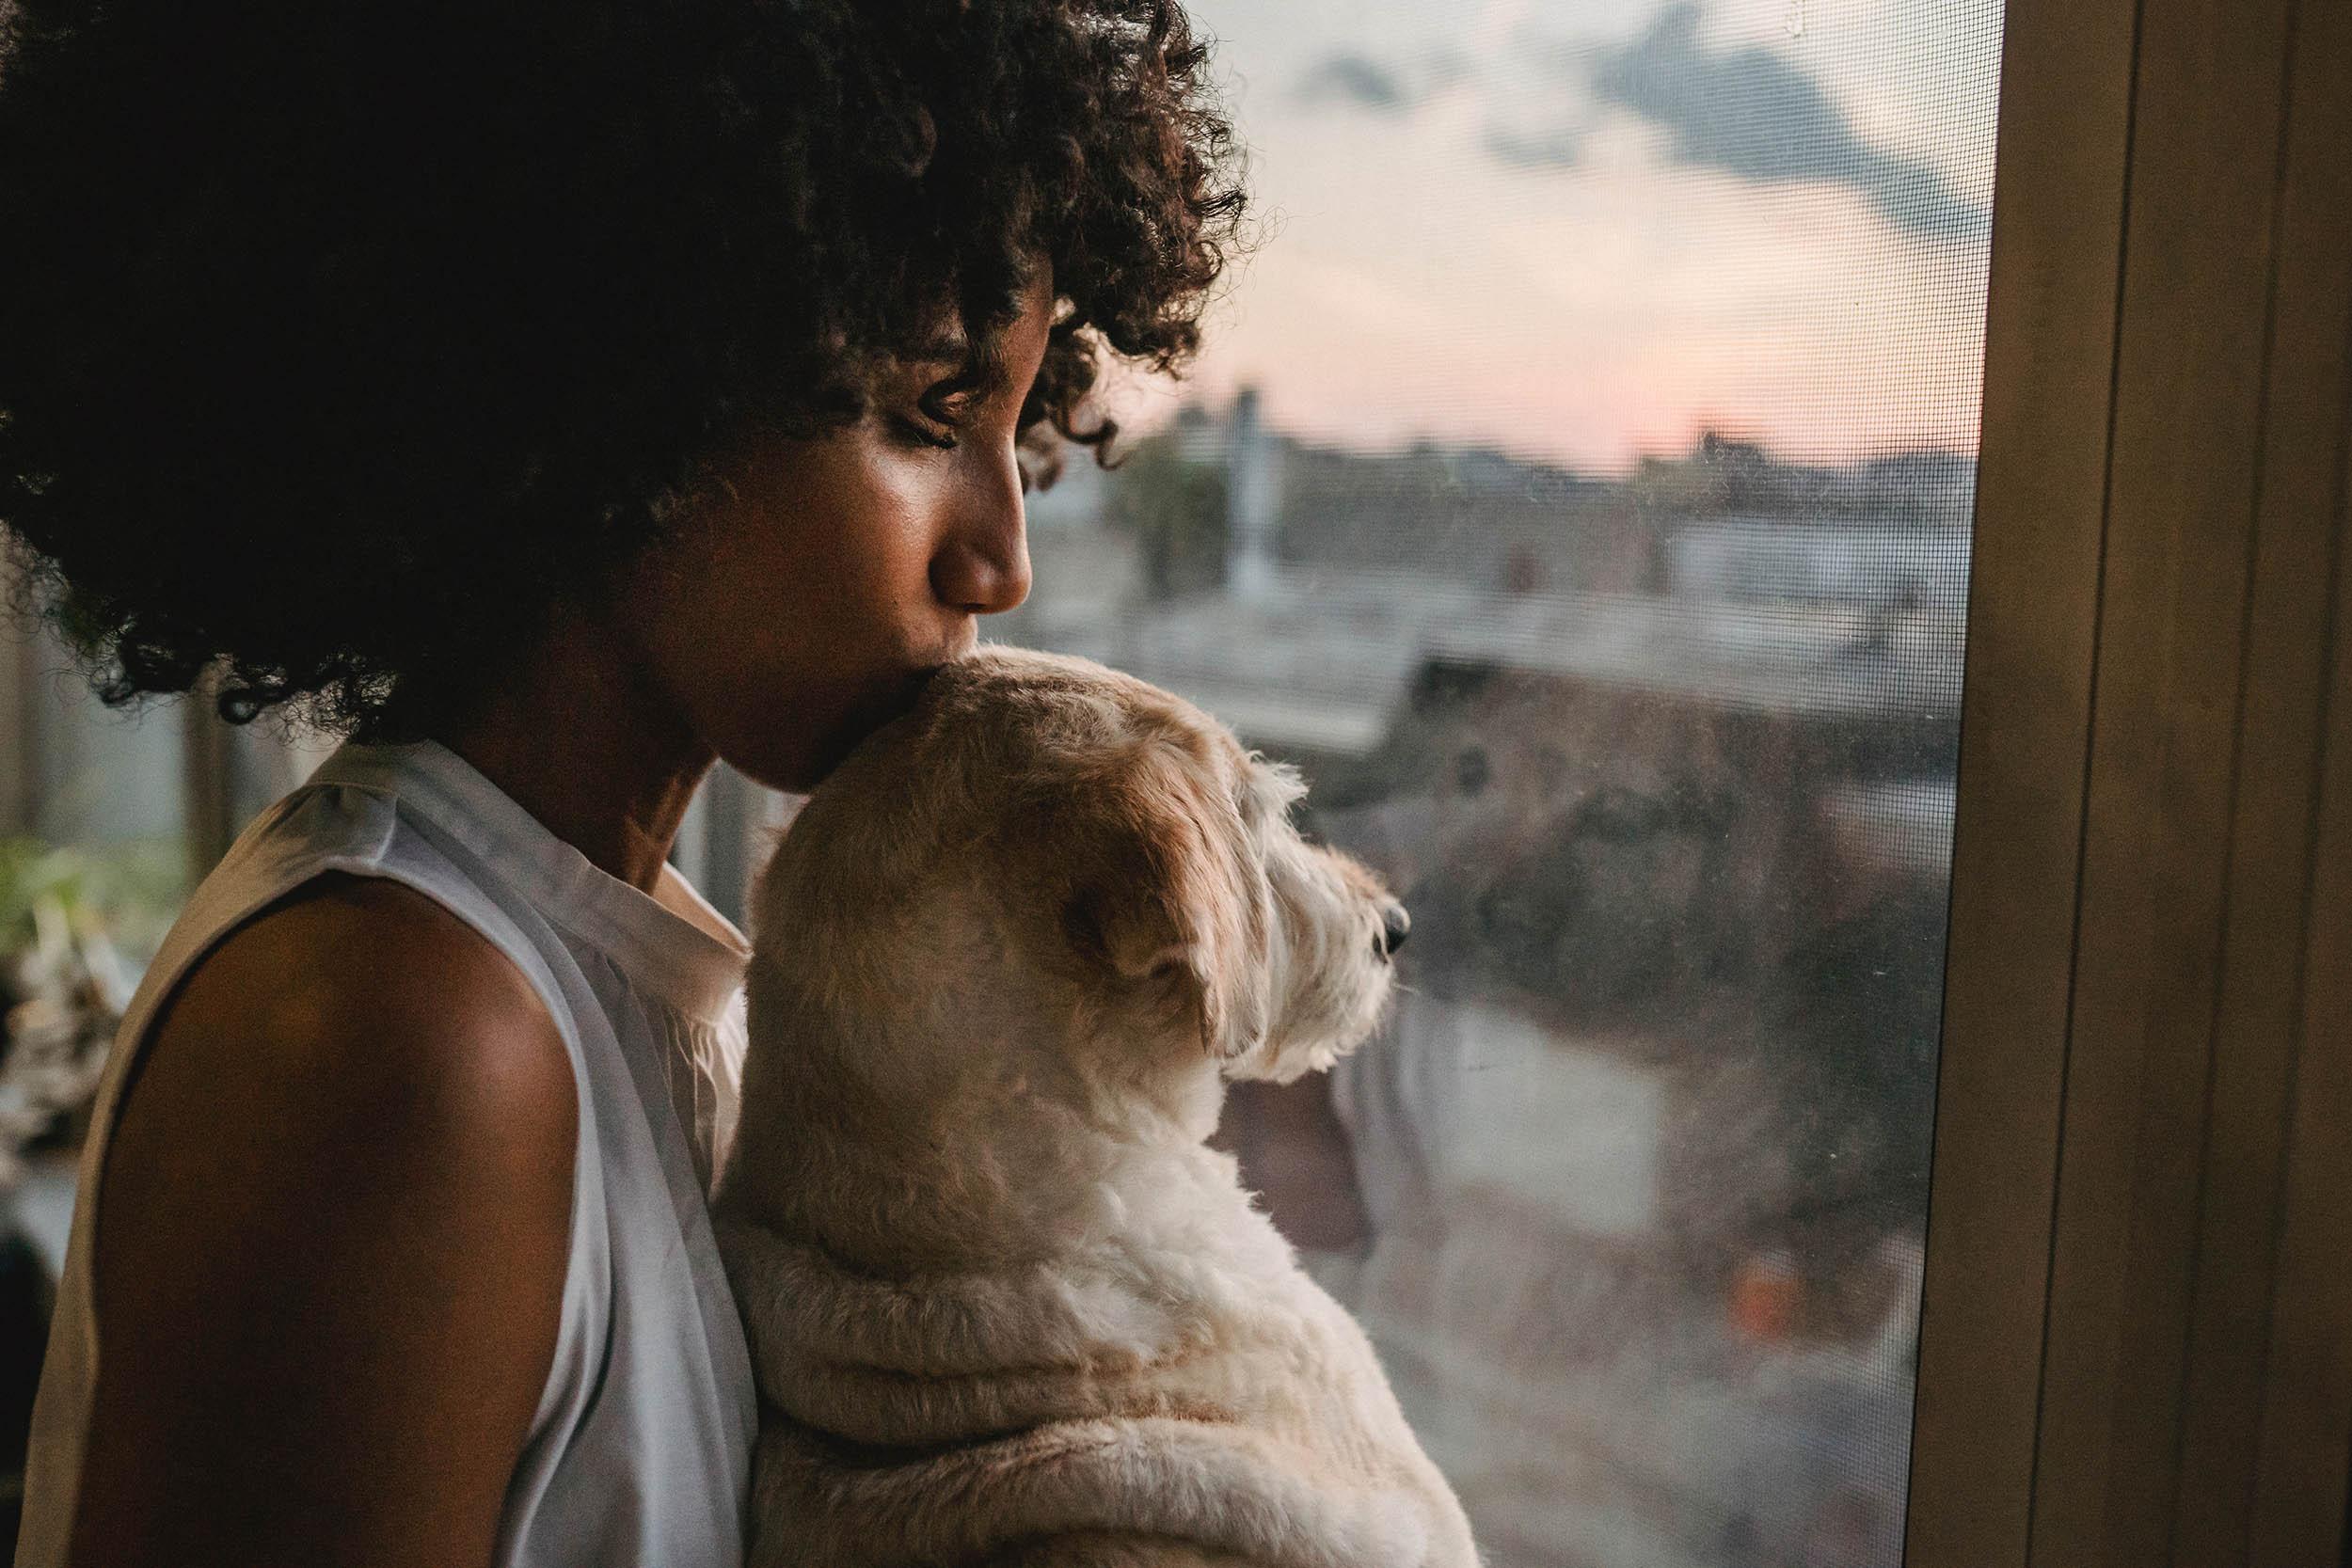 natural light ps 2 Basics Photography Portrait photography Basics that every photographer should know